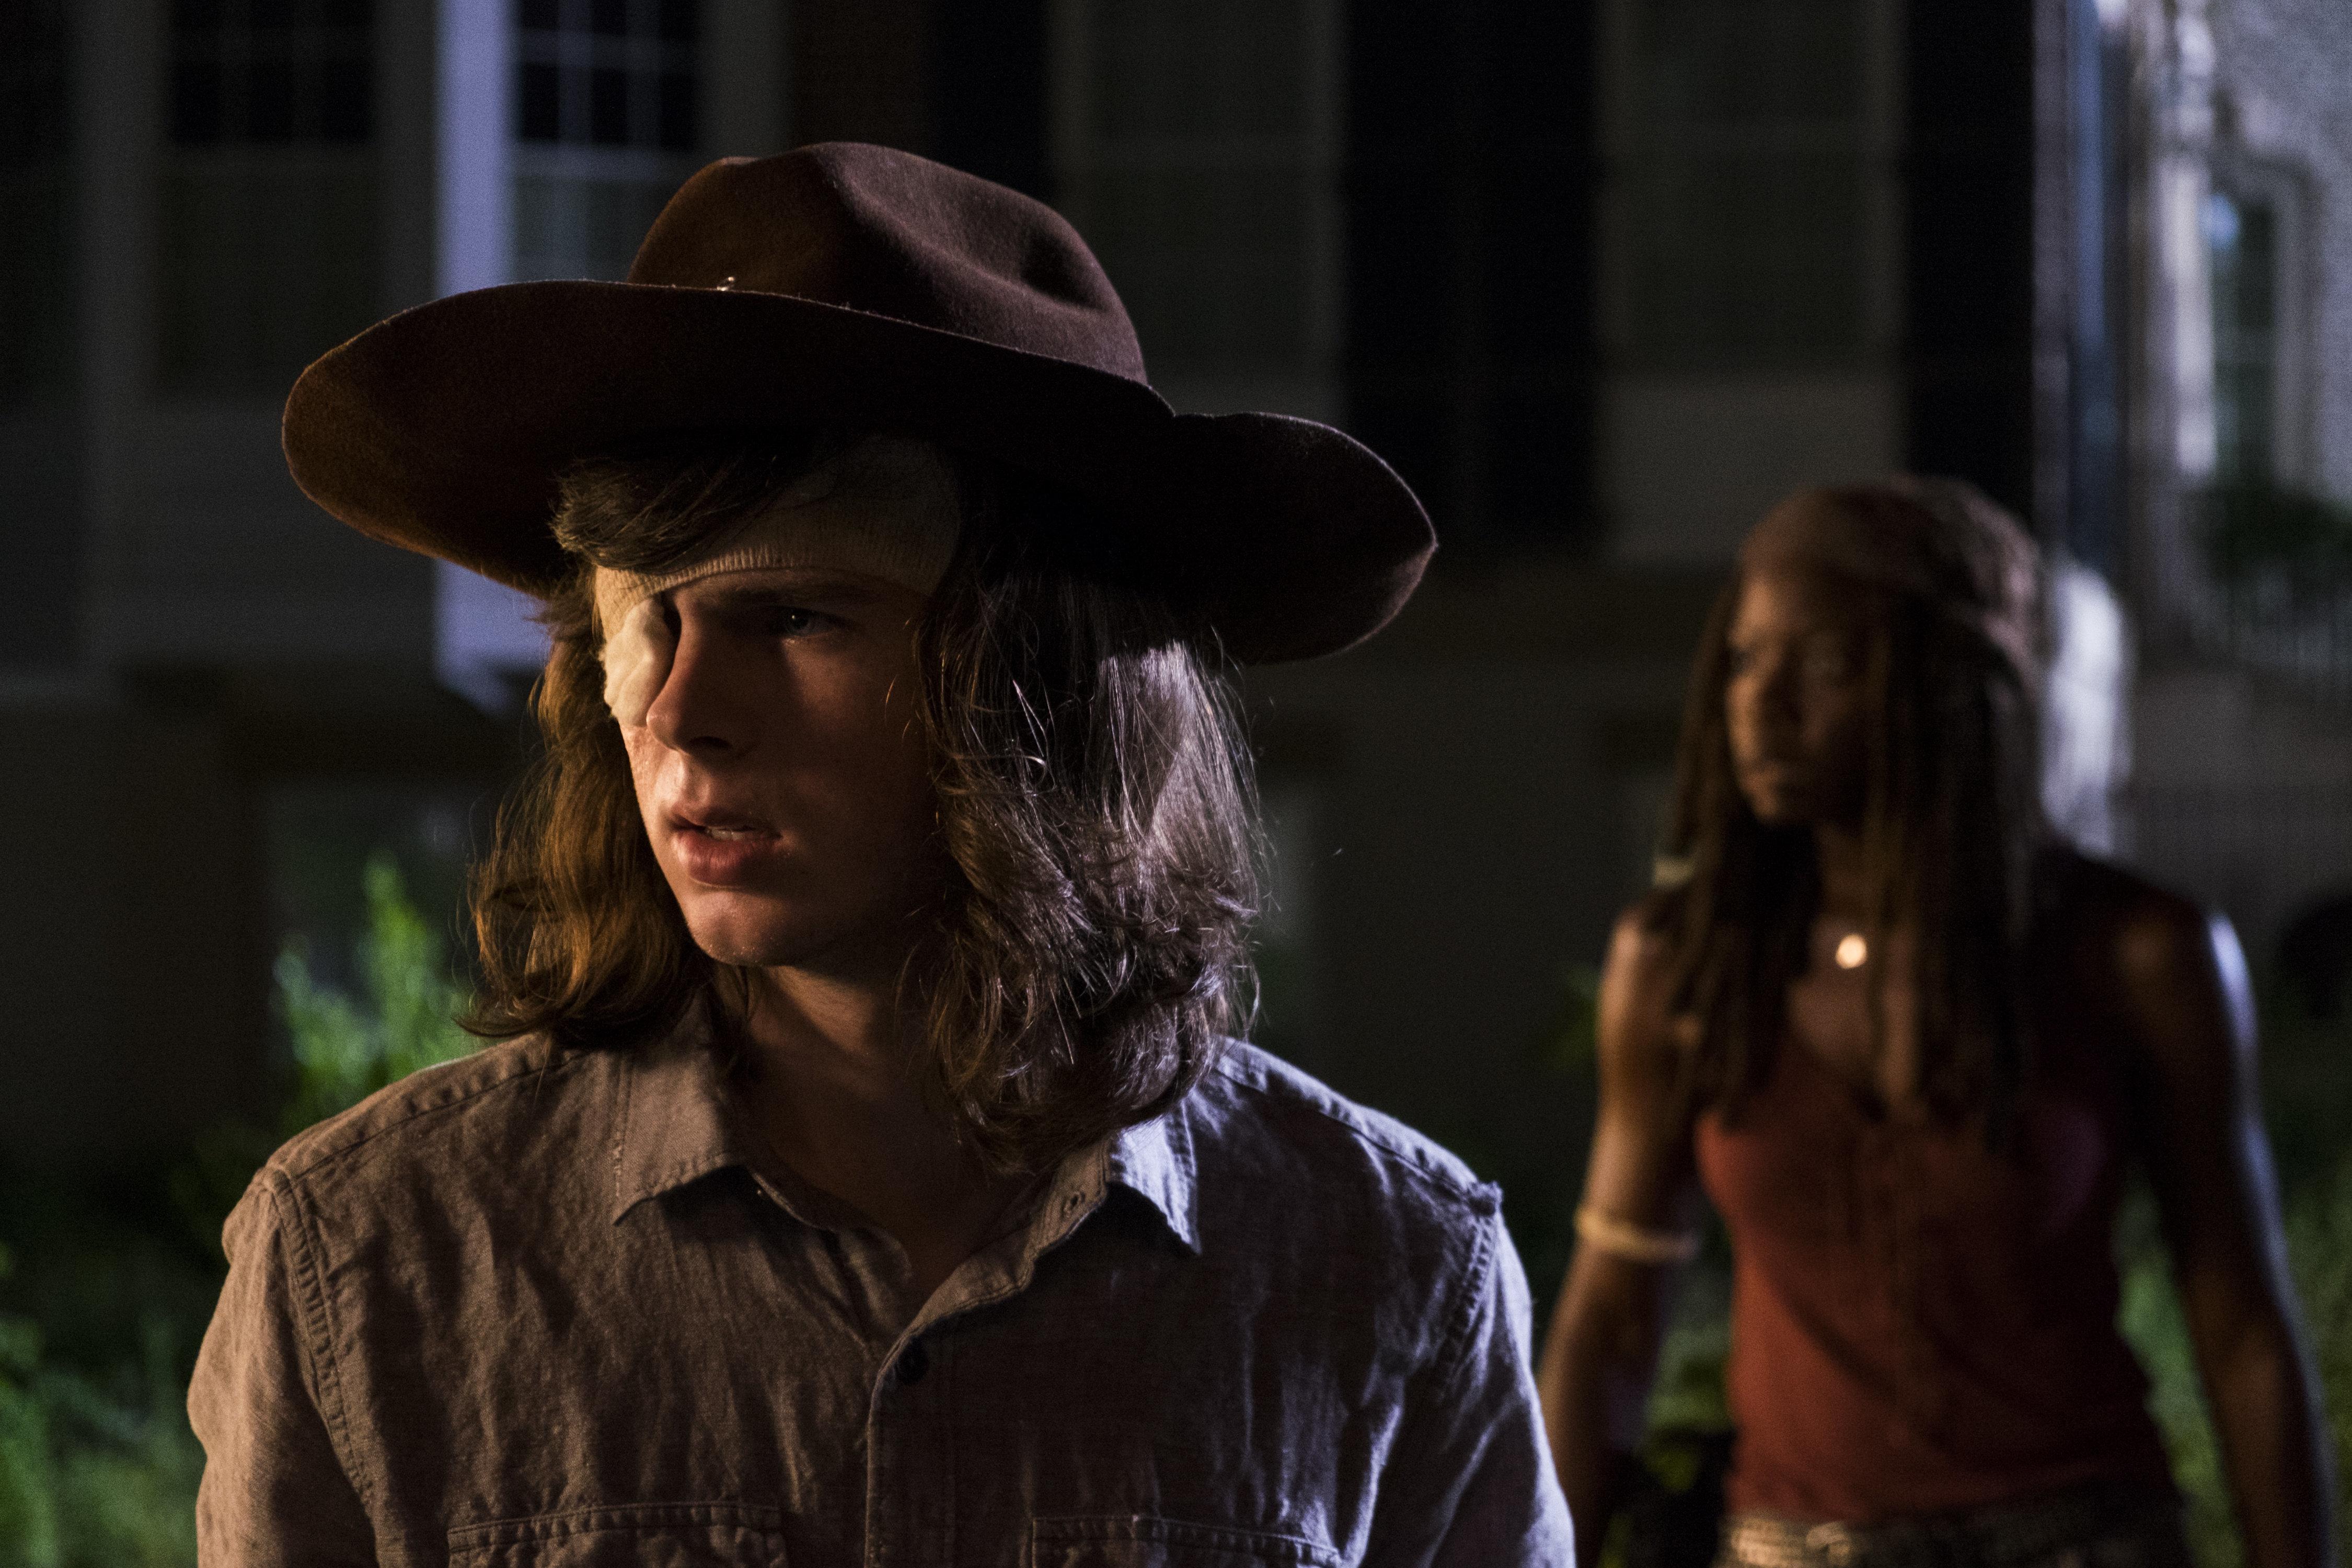 Chandler Riggs as Carl Grimes, Danai Gurira as Michonne - The Walking Dead _ Season 8, Episode 8 - Photo Credit: Gene Page/AMC